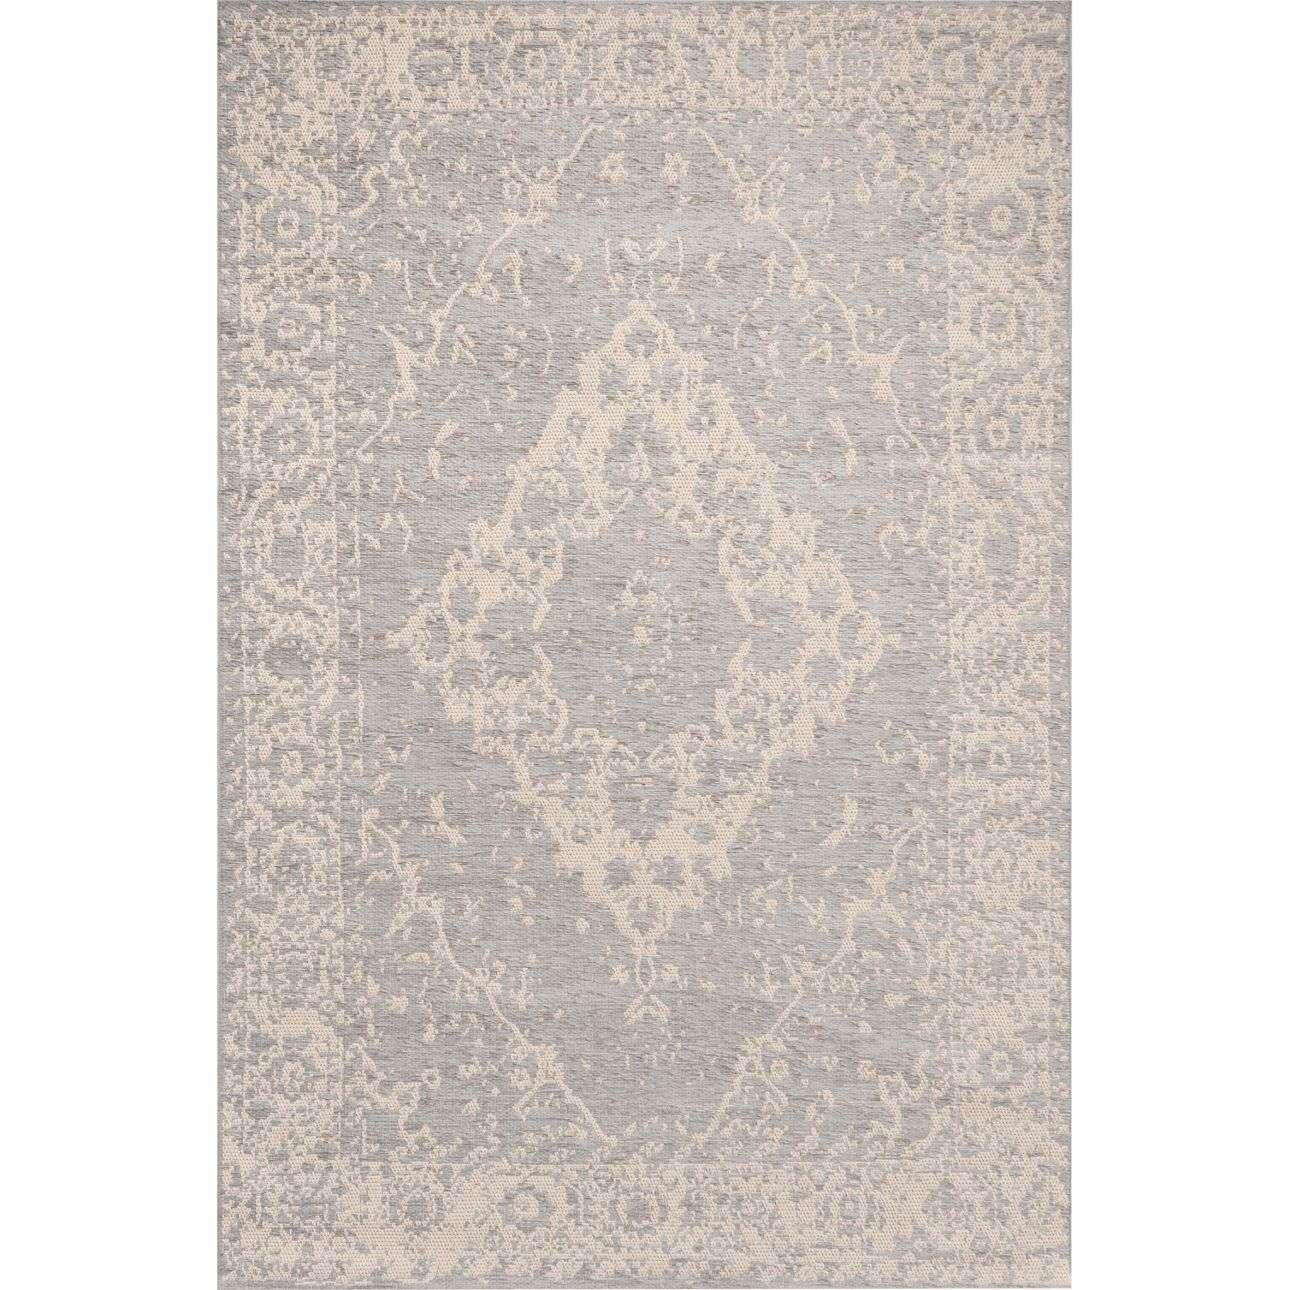 Dywan Breeze Serenity blue/wool 155x230cm